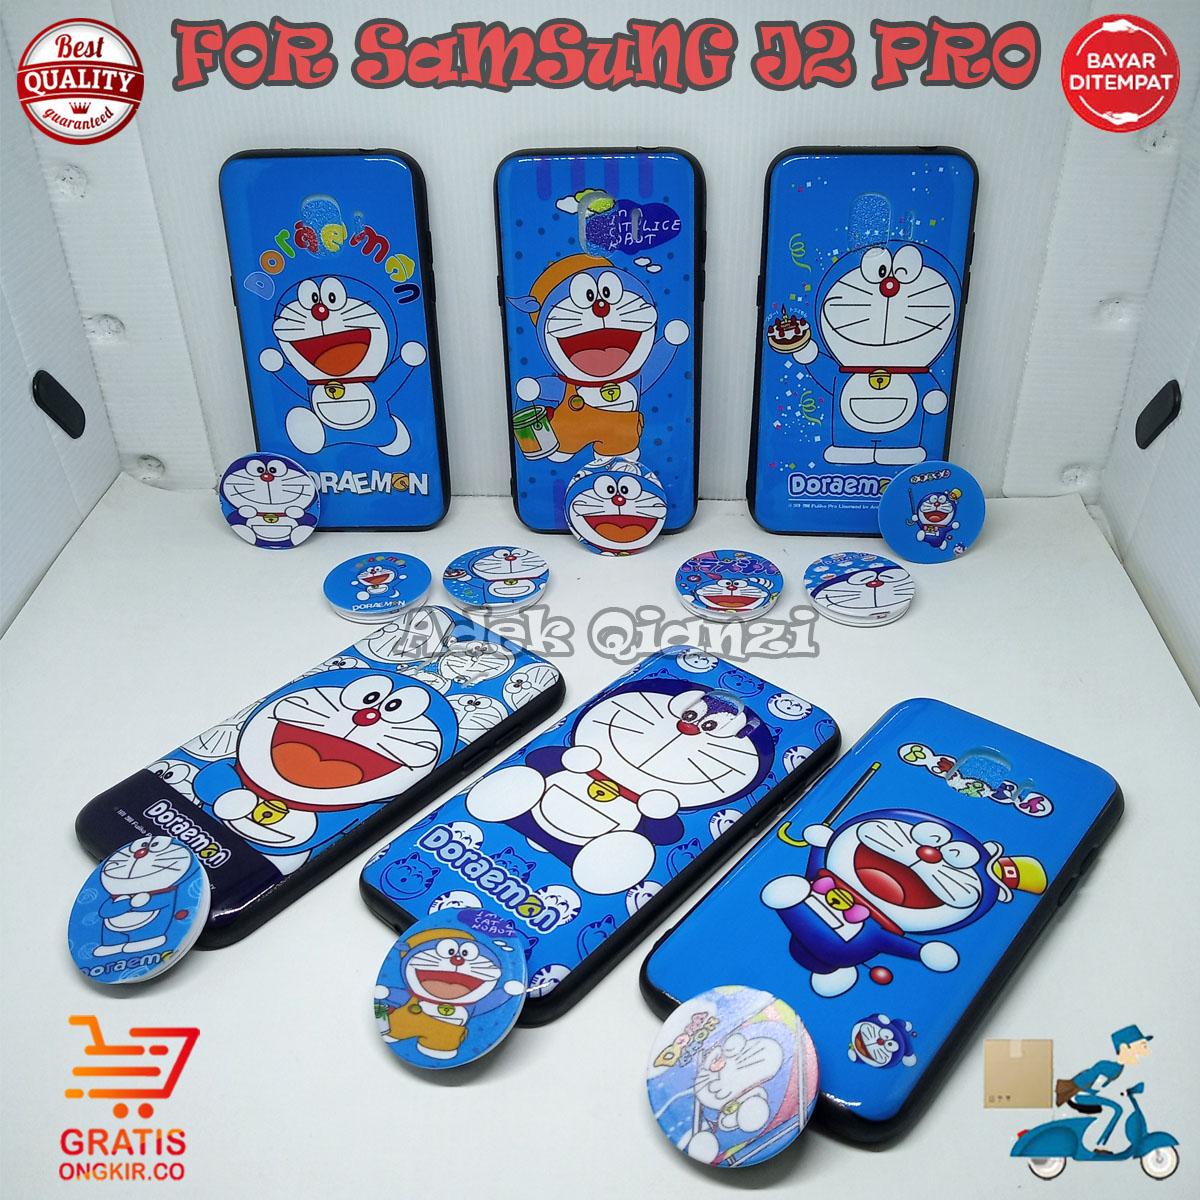 SofCase Casing Karakter Kartun Doraemon Lucu 3D Free Popsocket Cantik For SAMSUNG J2 PRO